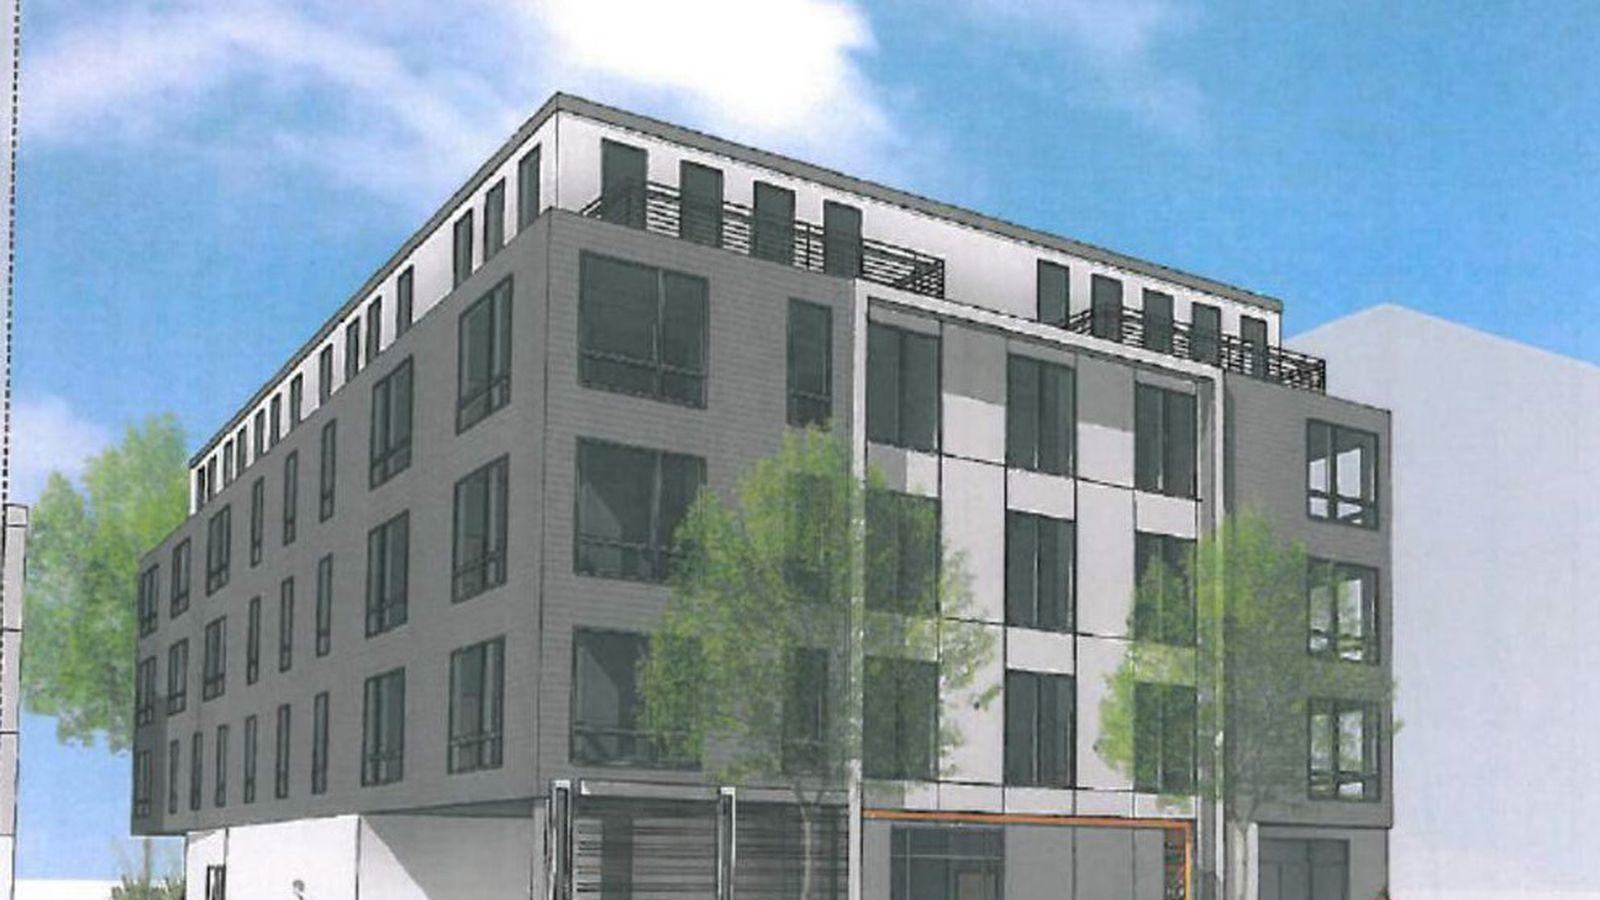 curbed boston archives boston development news page 4